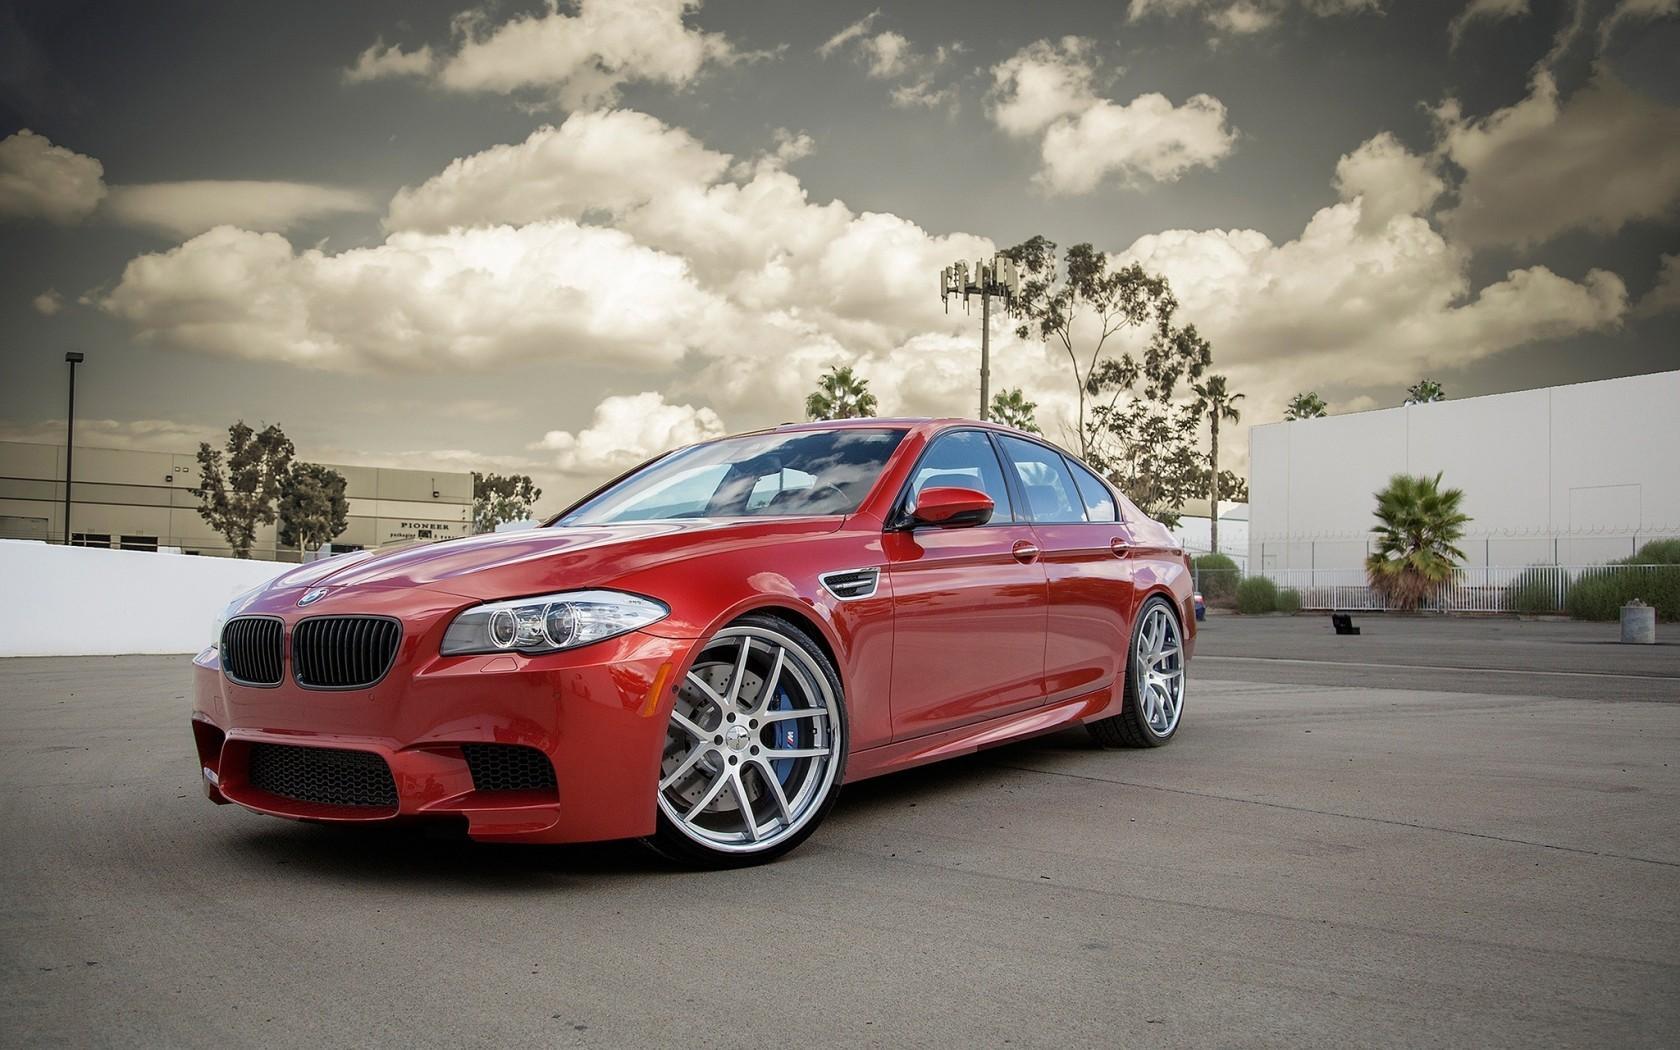 General 1680x1050 car BMW red cars vehicle BMW F10 BMW 5 Series